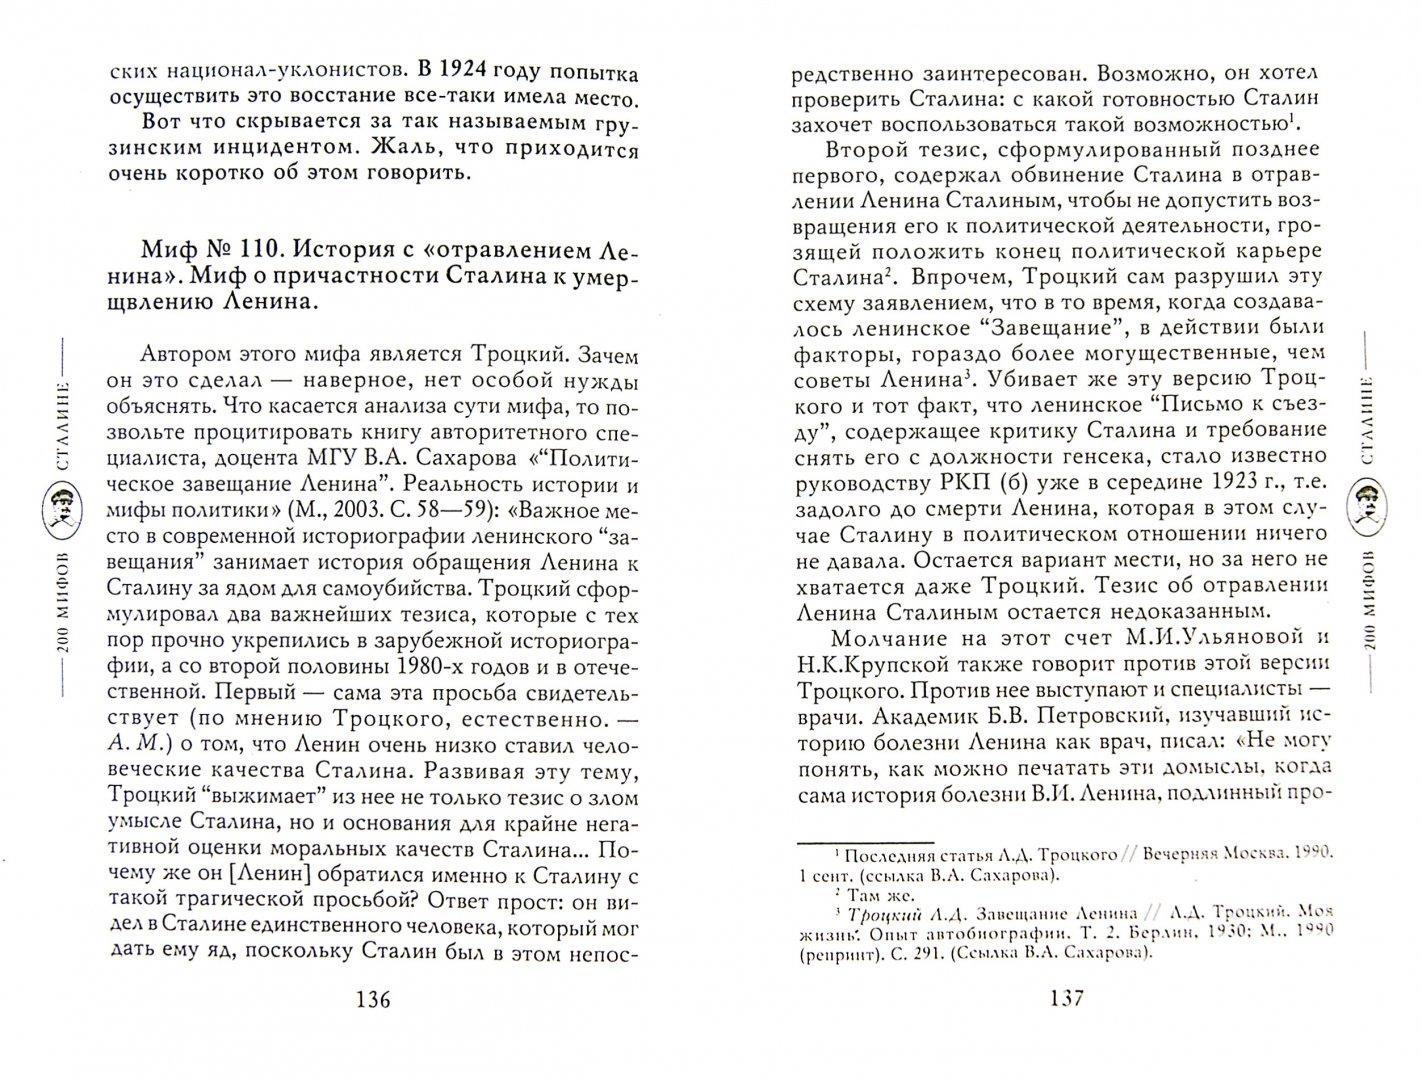 Иллюстрация 1 из 21 для Сталин. Биография вождя - Арсен Мартиросян | Лабиринт - книги. Источник: Лабиринт